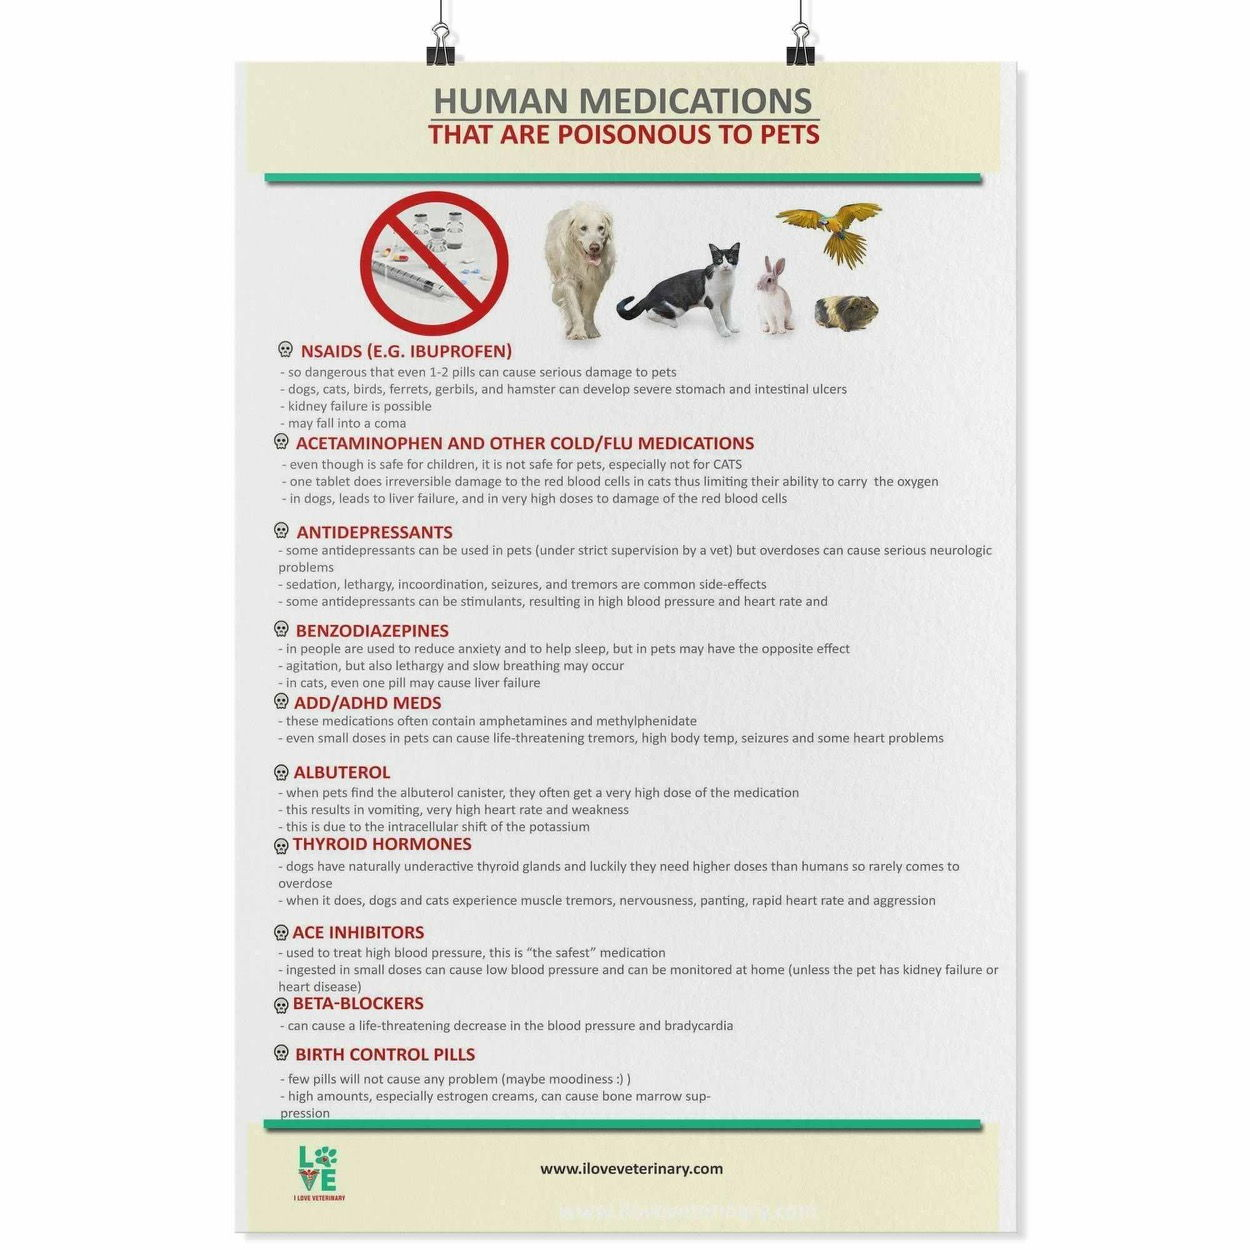 Human Medications